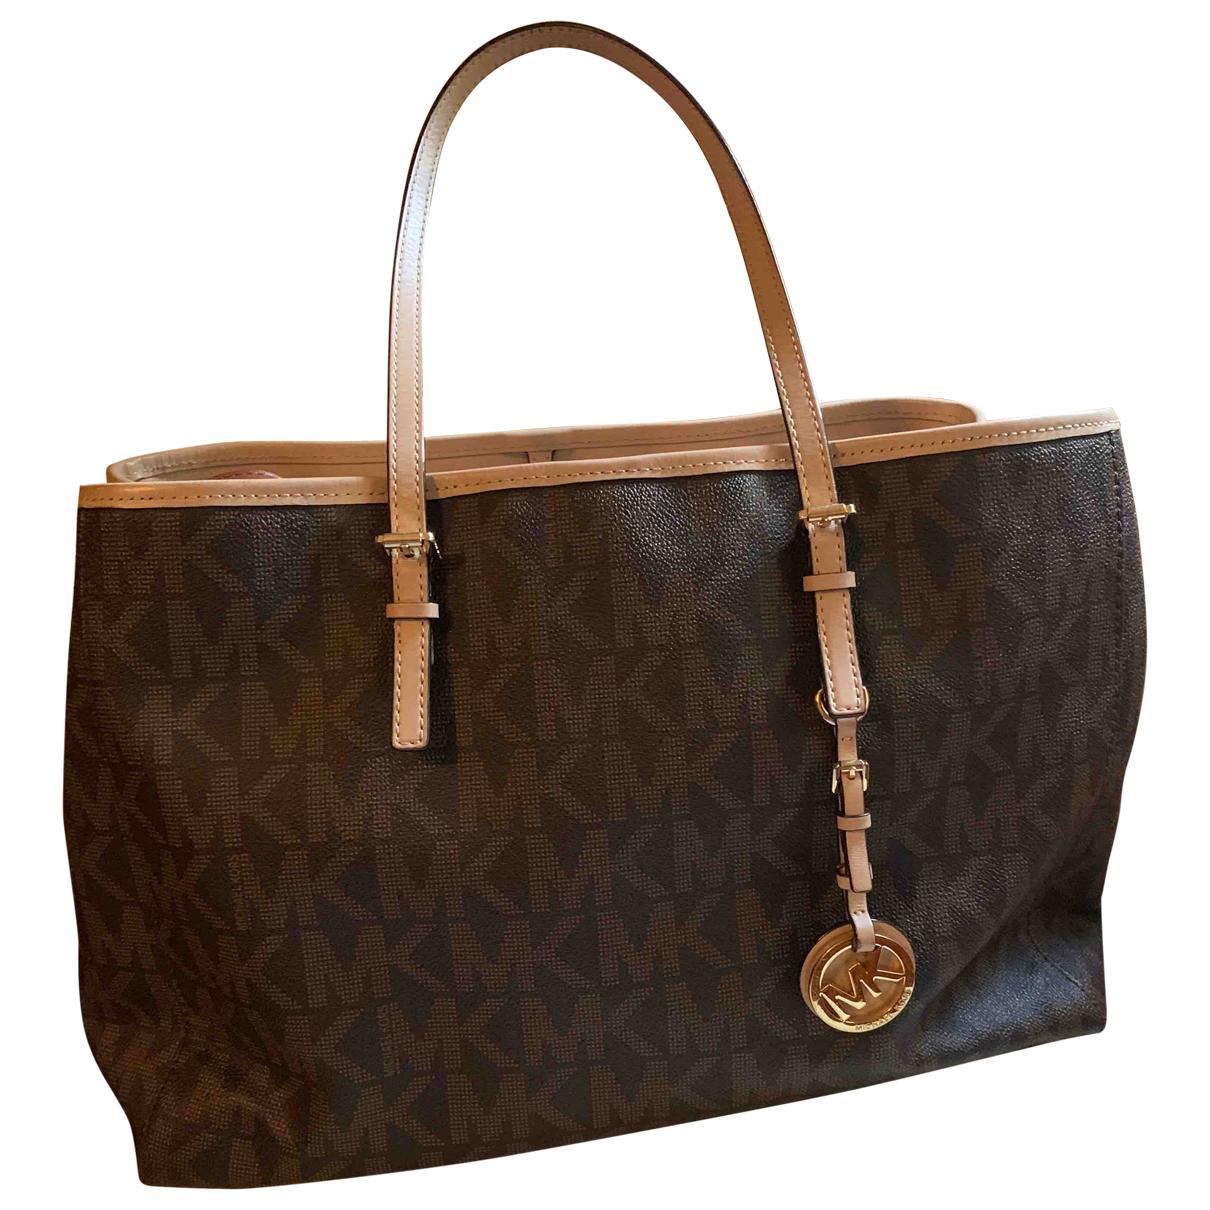 Michael Kors Jet Set Brown Leather handbag for Women \N